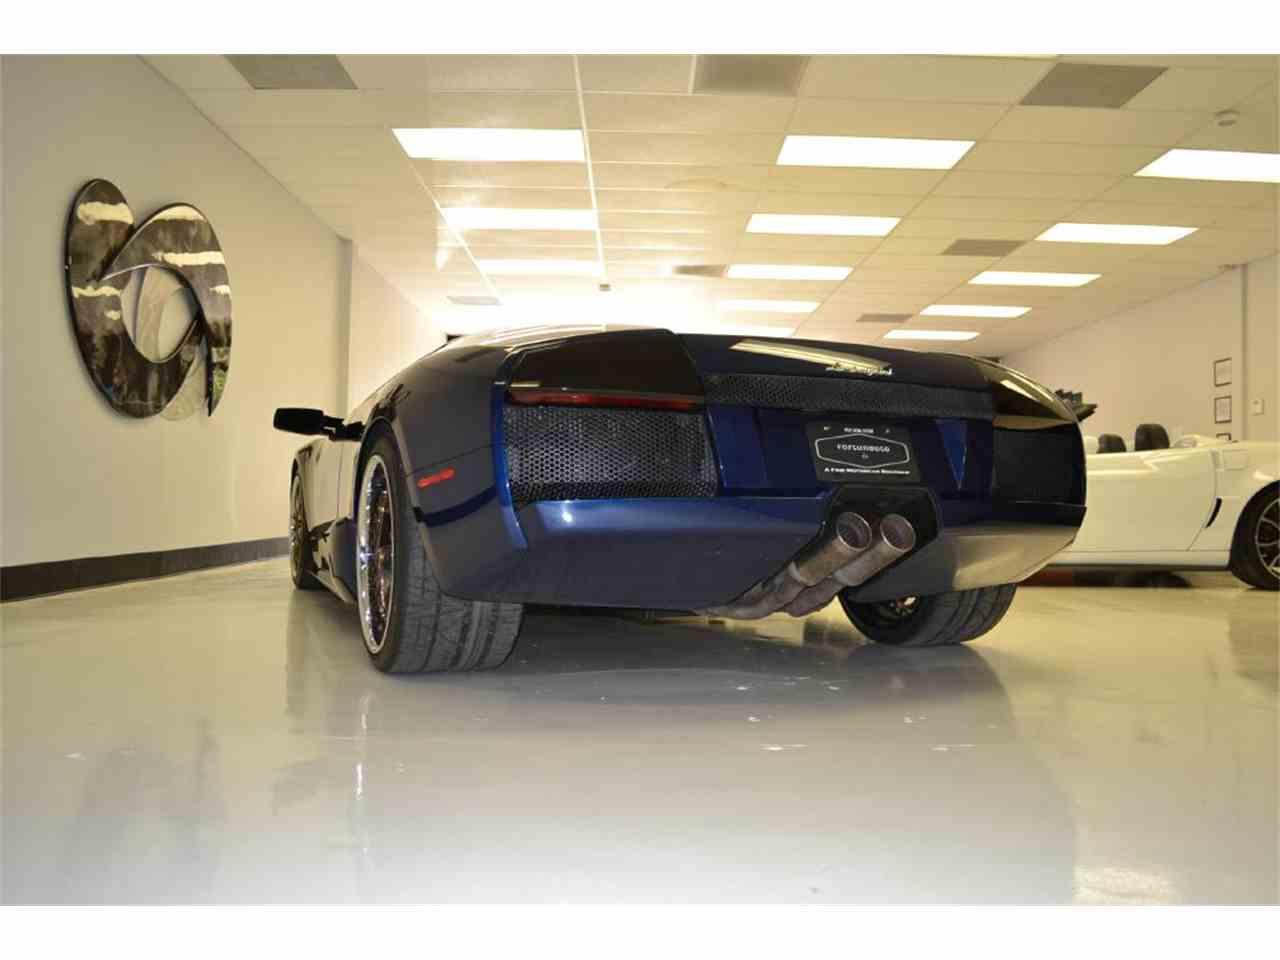 Large Picture of '04 Lamborghini Murcielago located in Temecula California Offered by Fortunauto 13 LLC - LVJ1